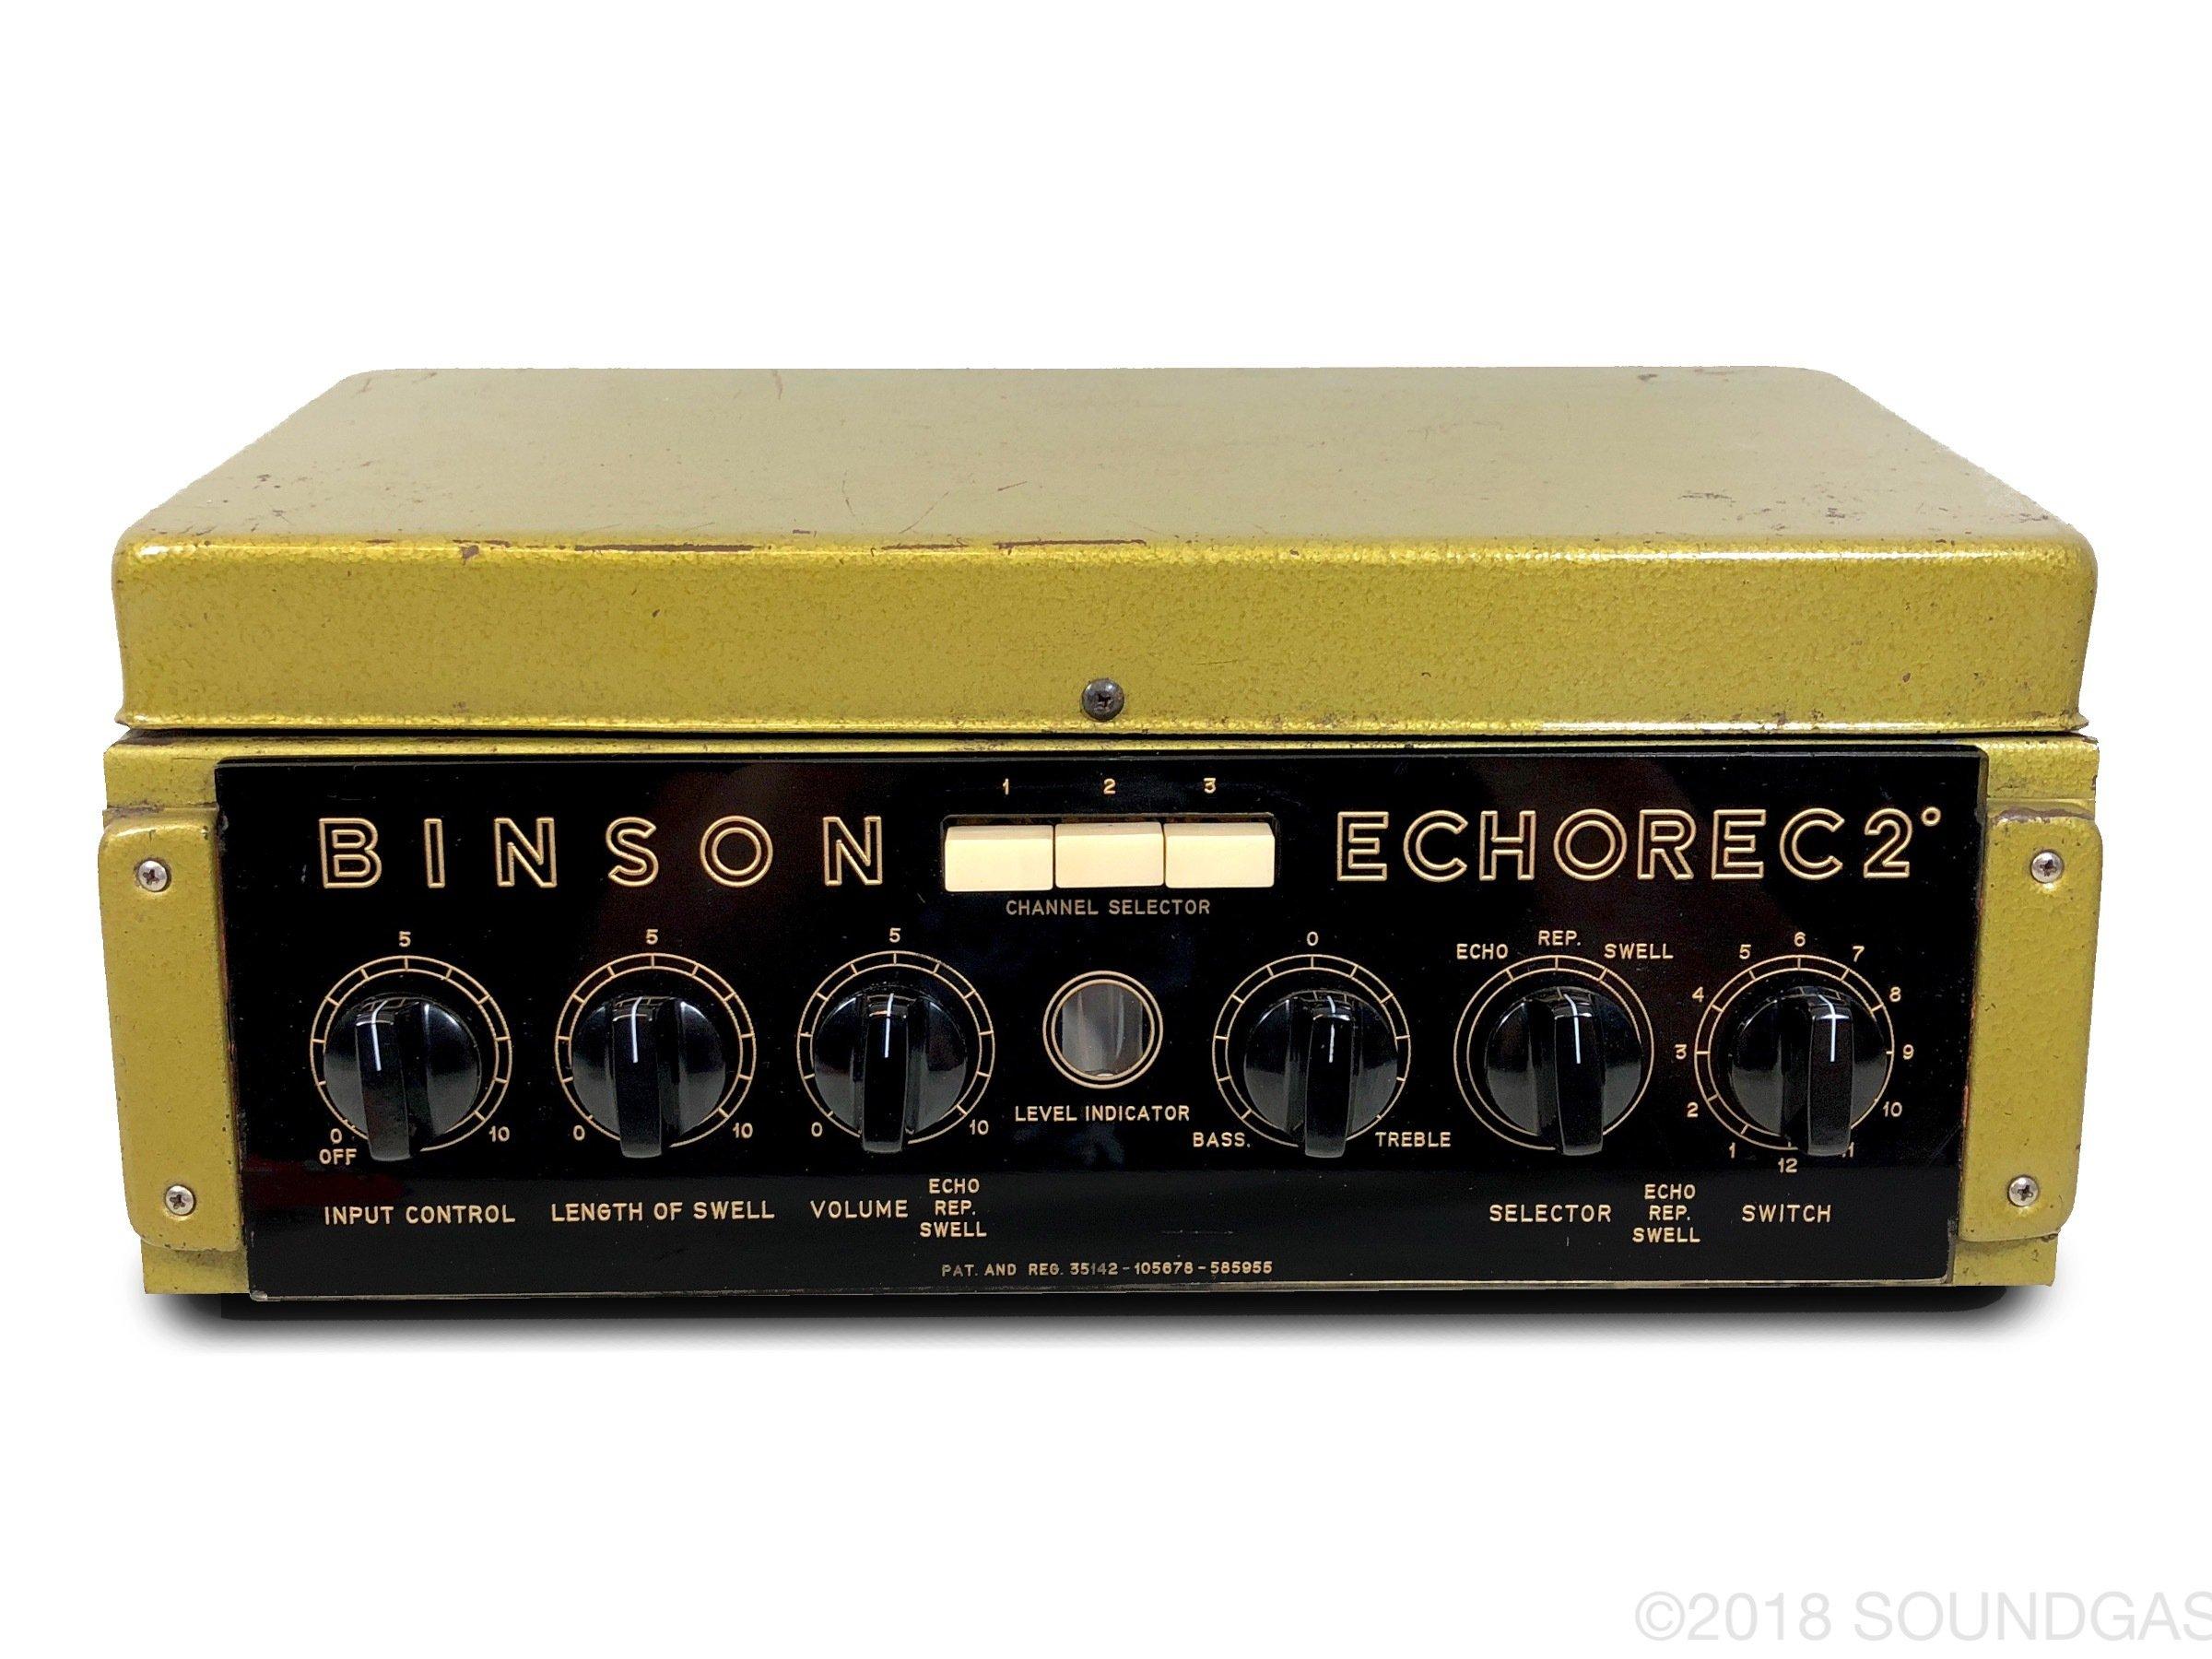 Binson-Echorec-2-T7E-Cover-2_7e758783-4999-4926-ba62-edaad606953f